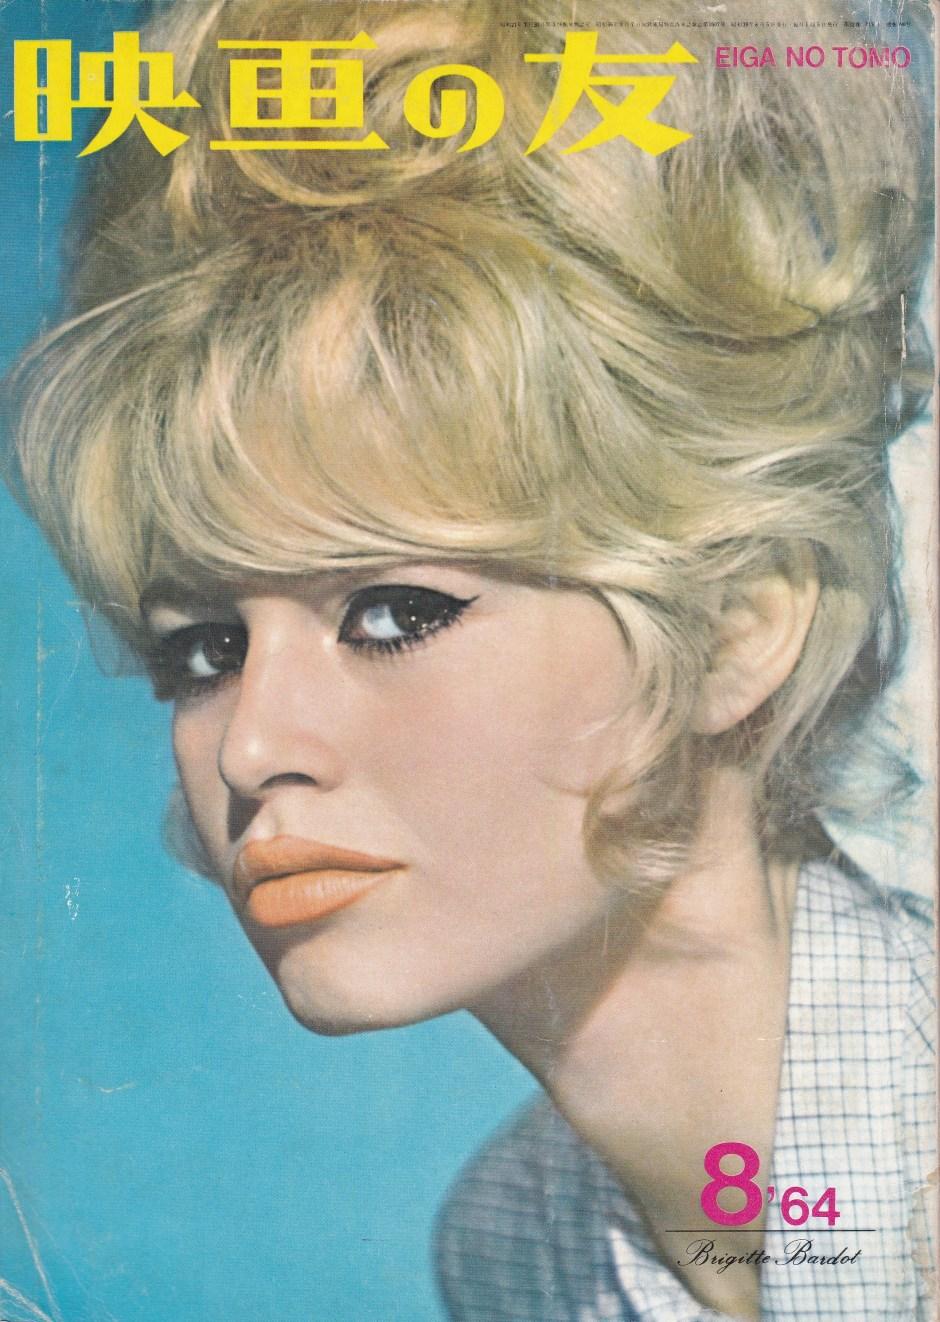 Eiga no Tomo_August 1964_Brigette Bardot cover